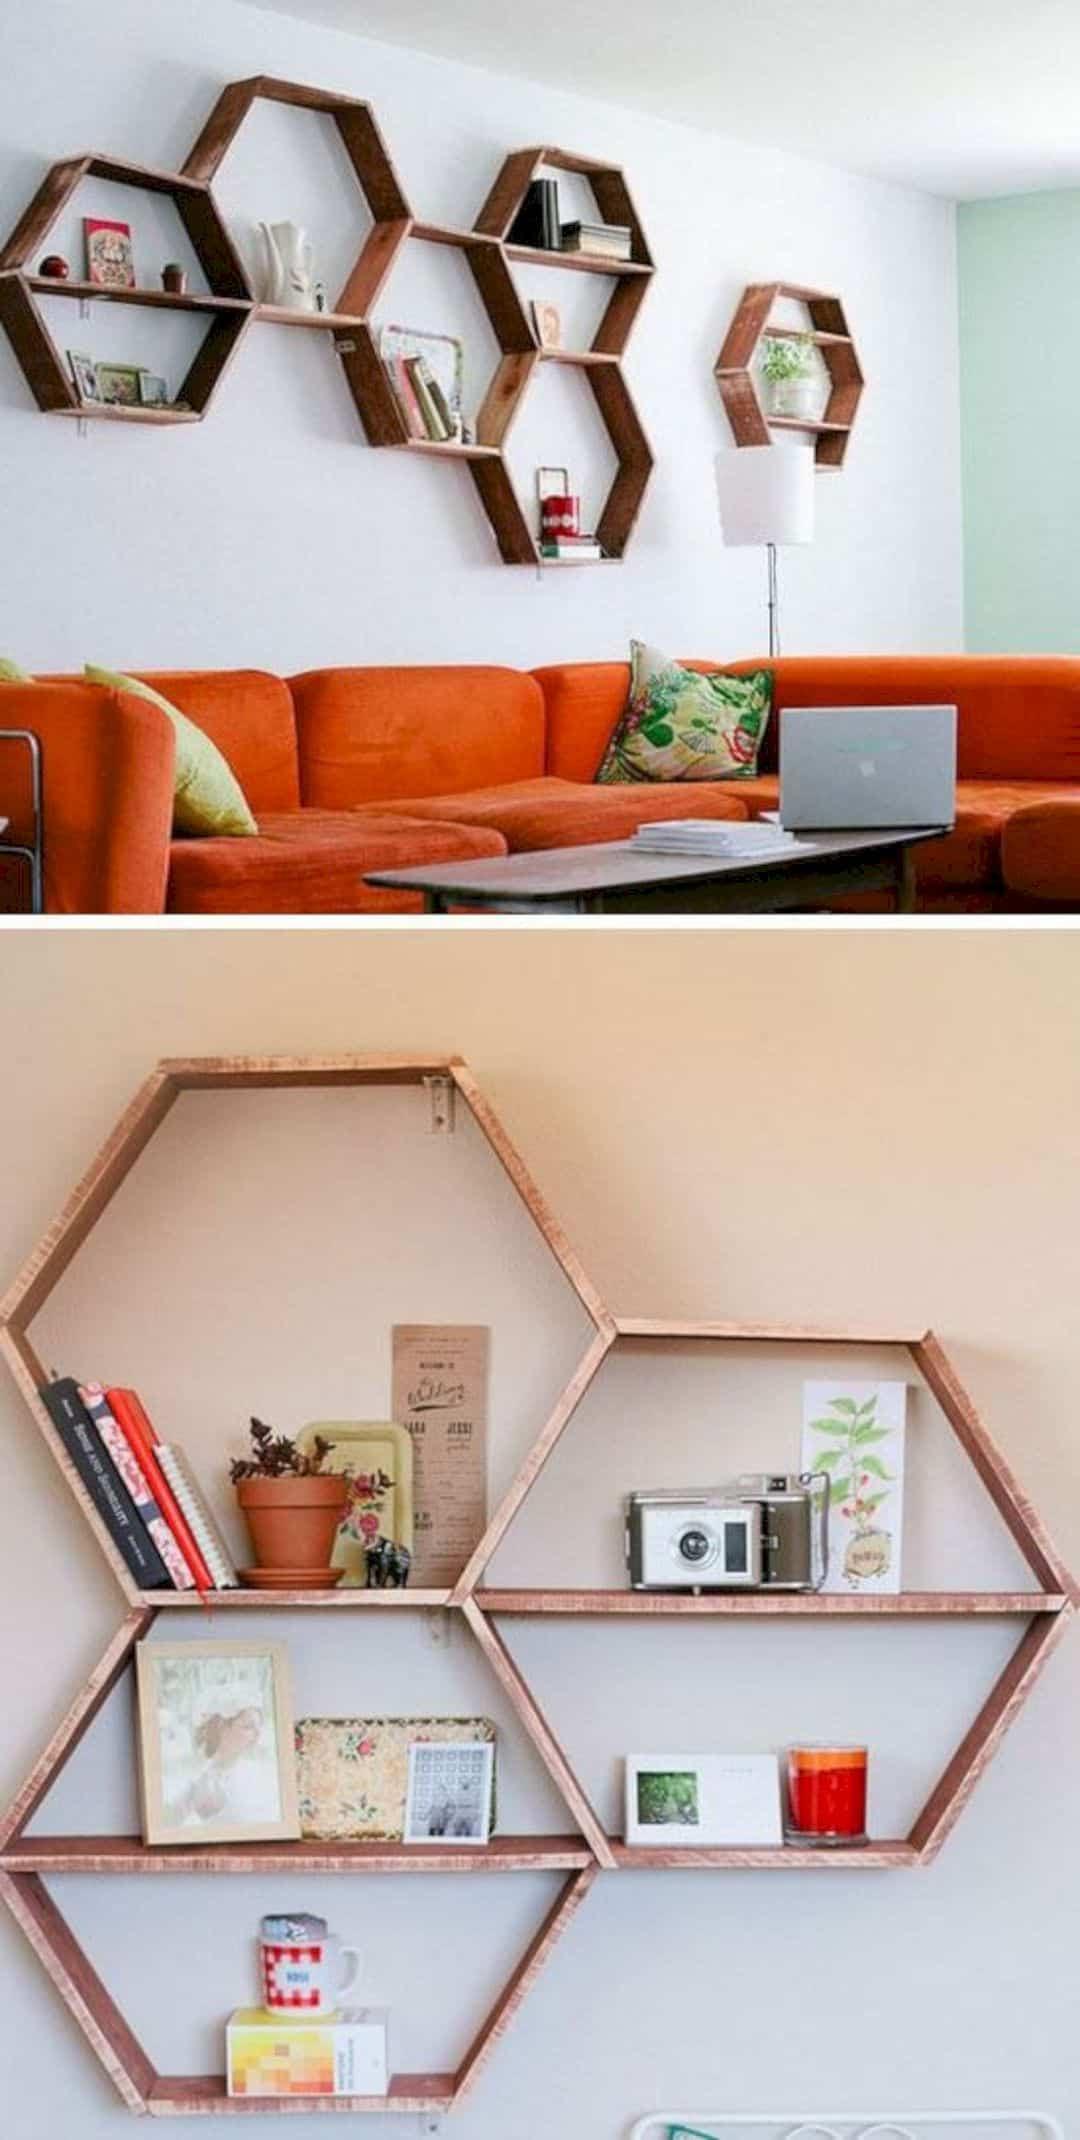 Diy Living Room Ideas  17 DIY Home Decor for Living Room Futurist Architecture